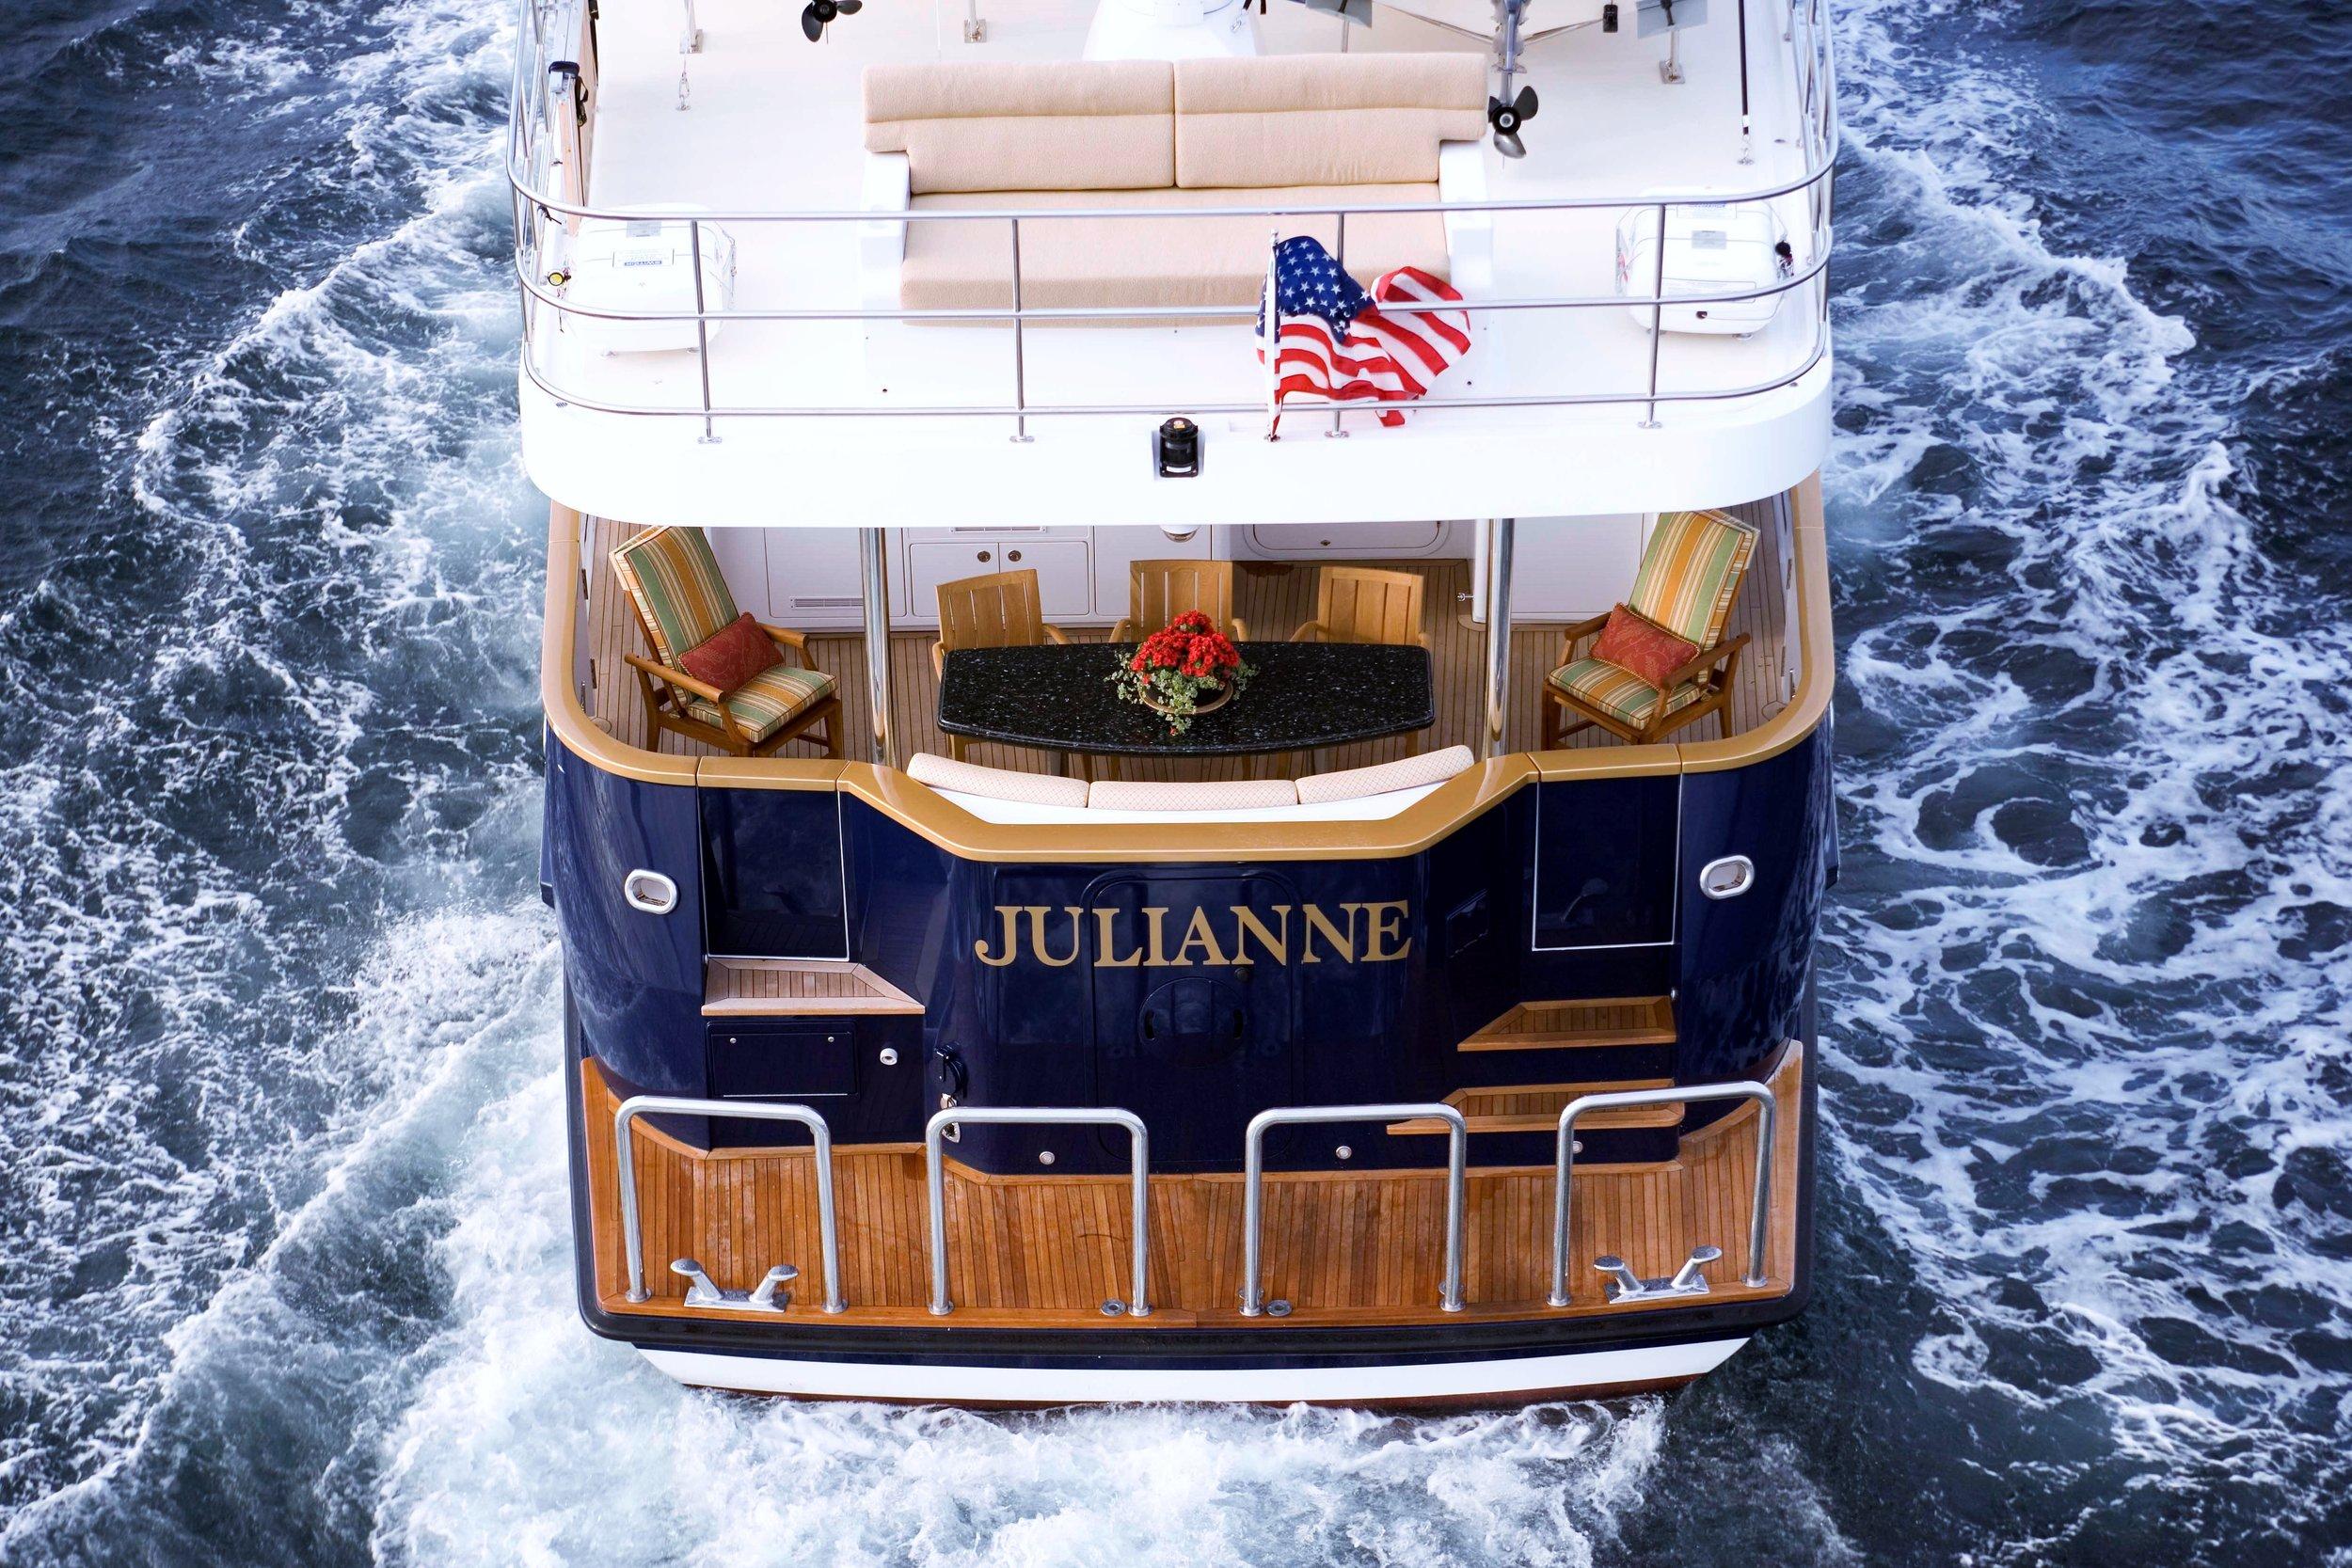 Juliann stern pic2 1MB.jpg